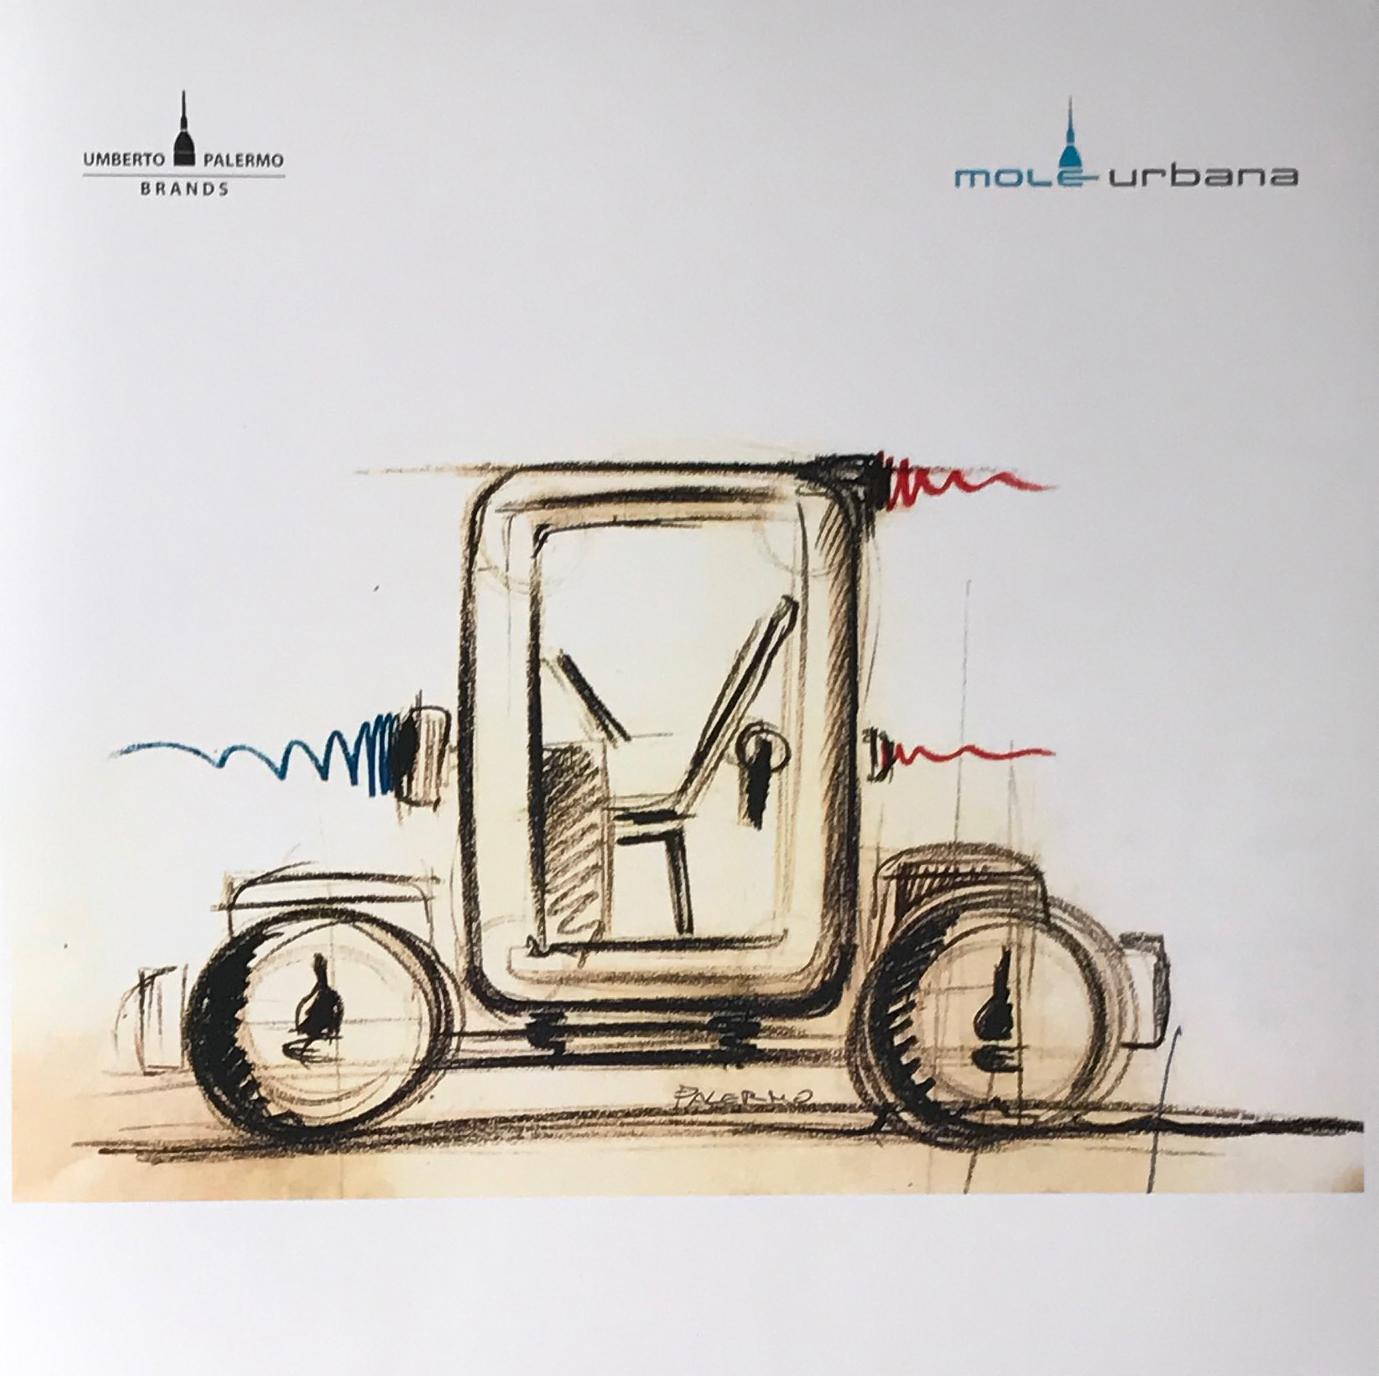 Mole Urbana by Umberto Palermo UP Design